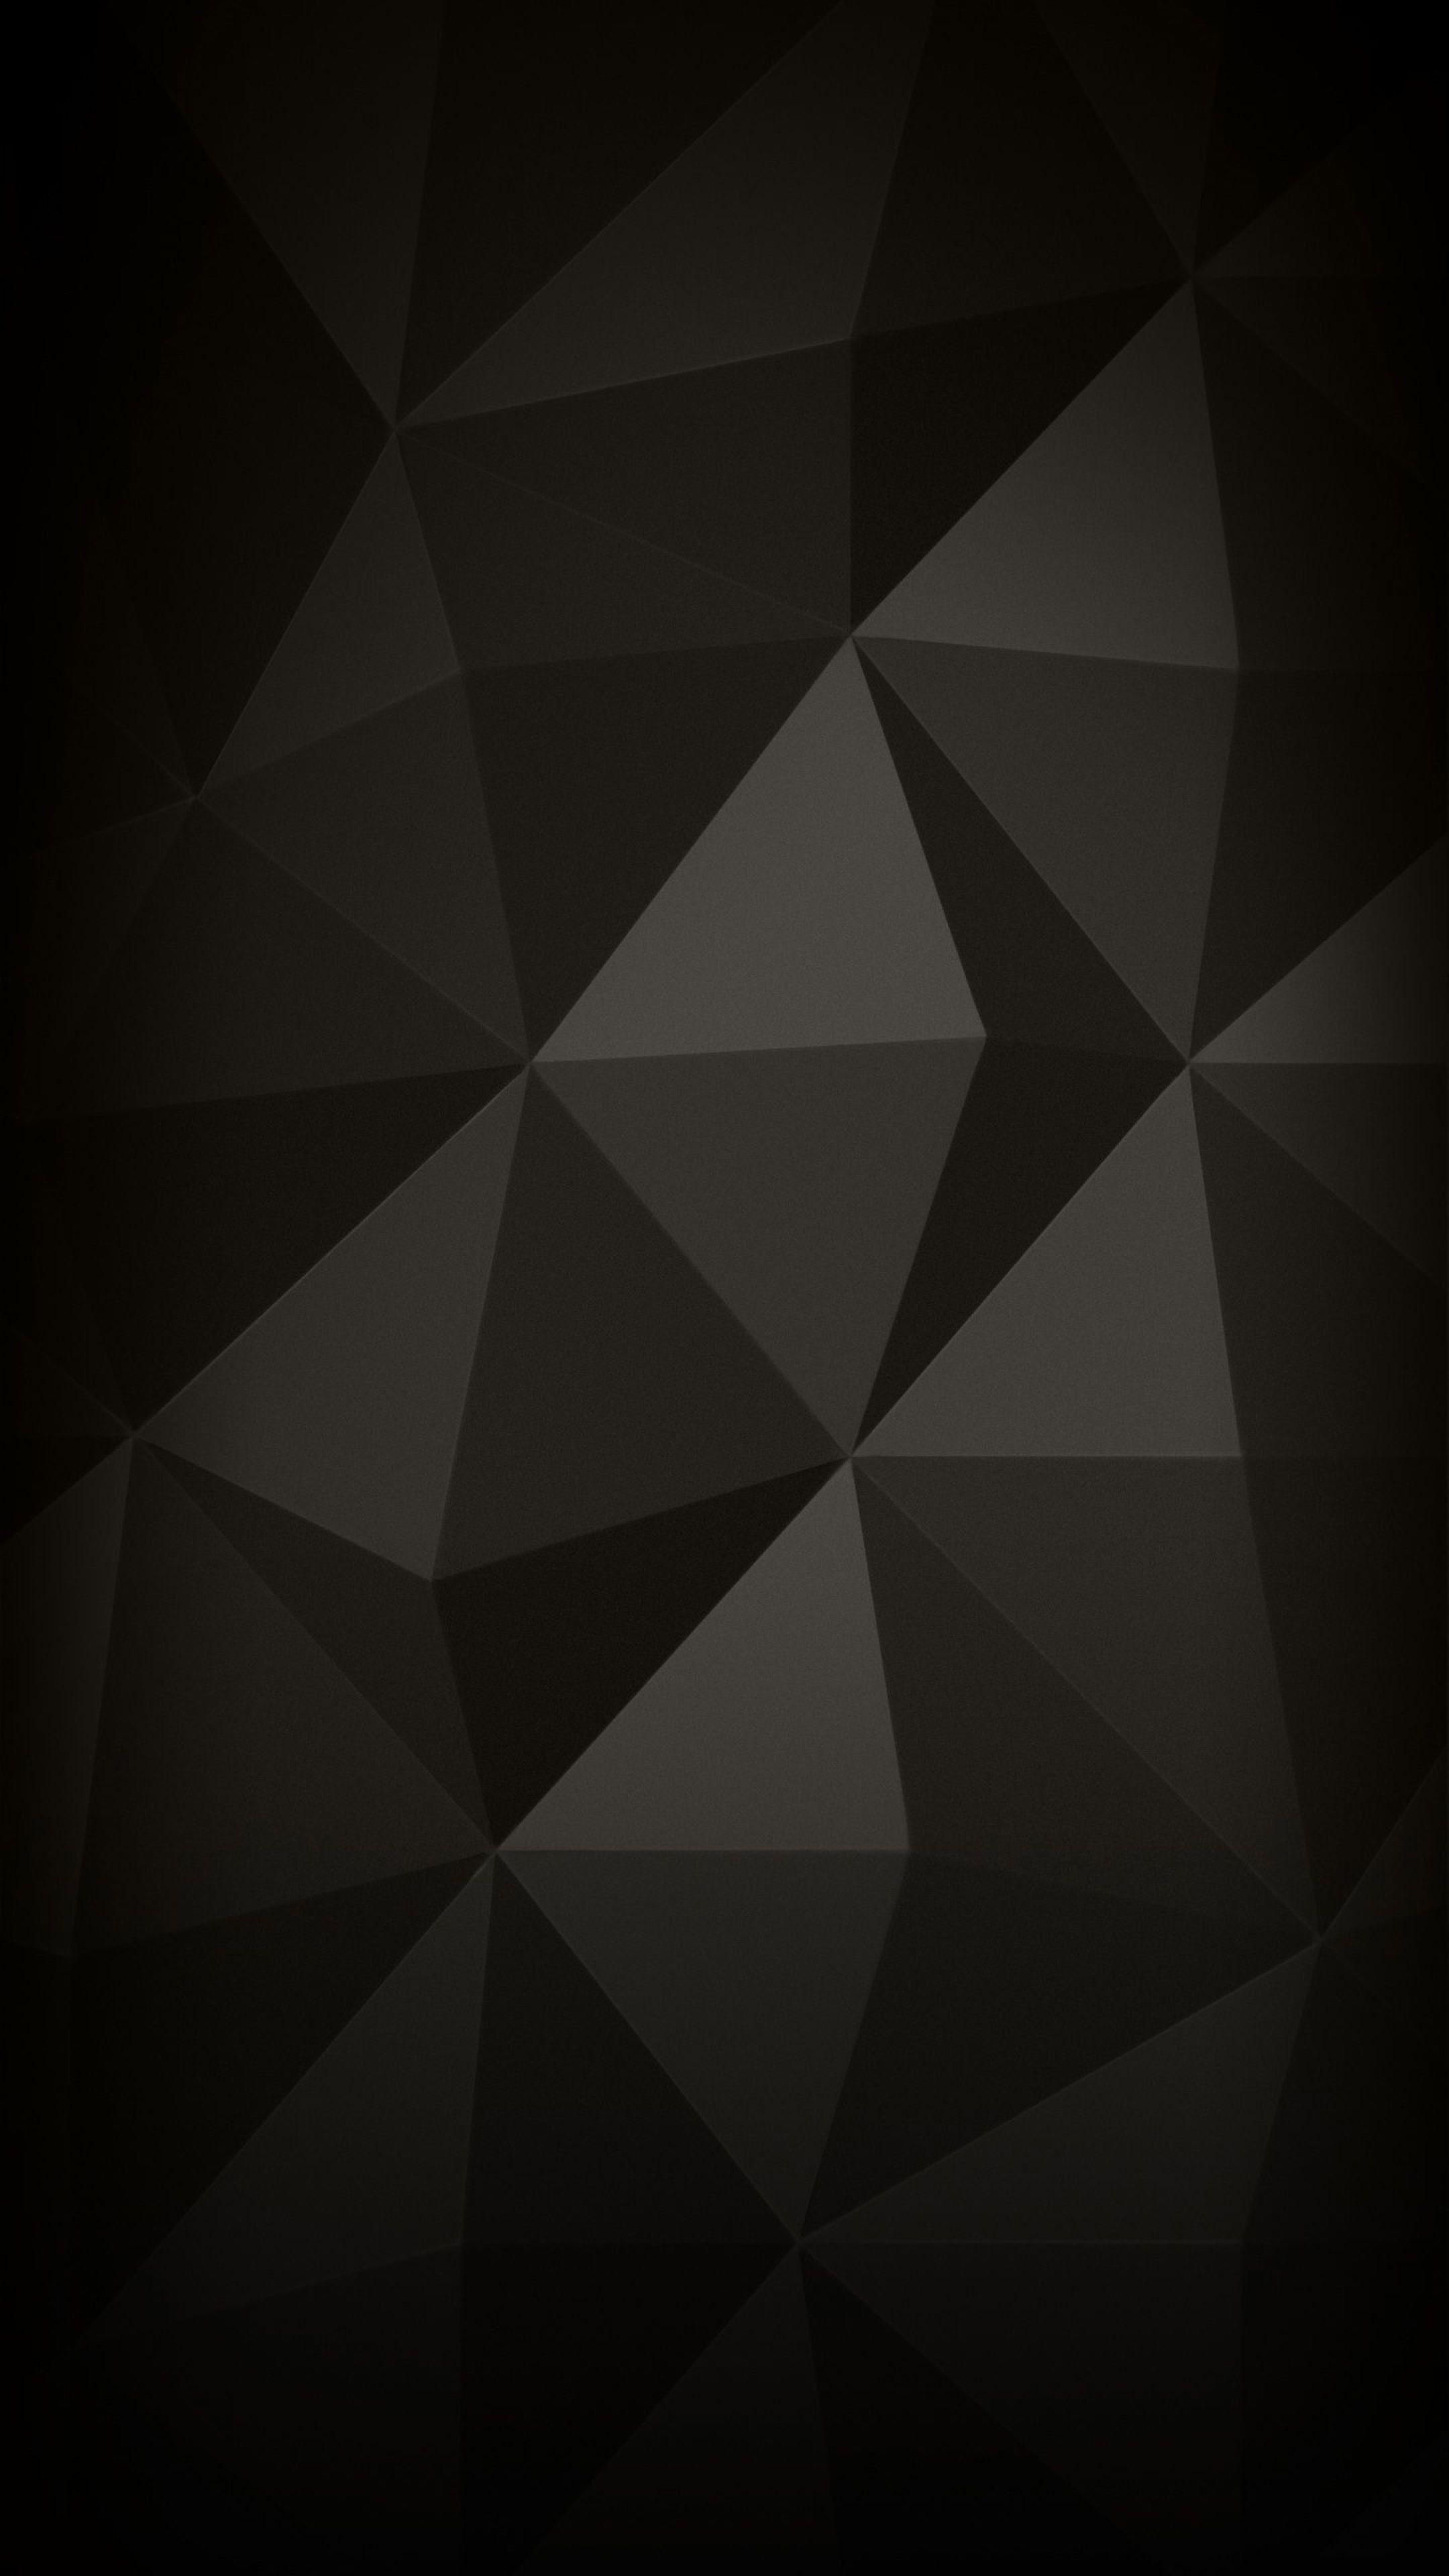 Black Mobile 4k Wallpapers Wallpaper Cave